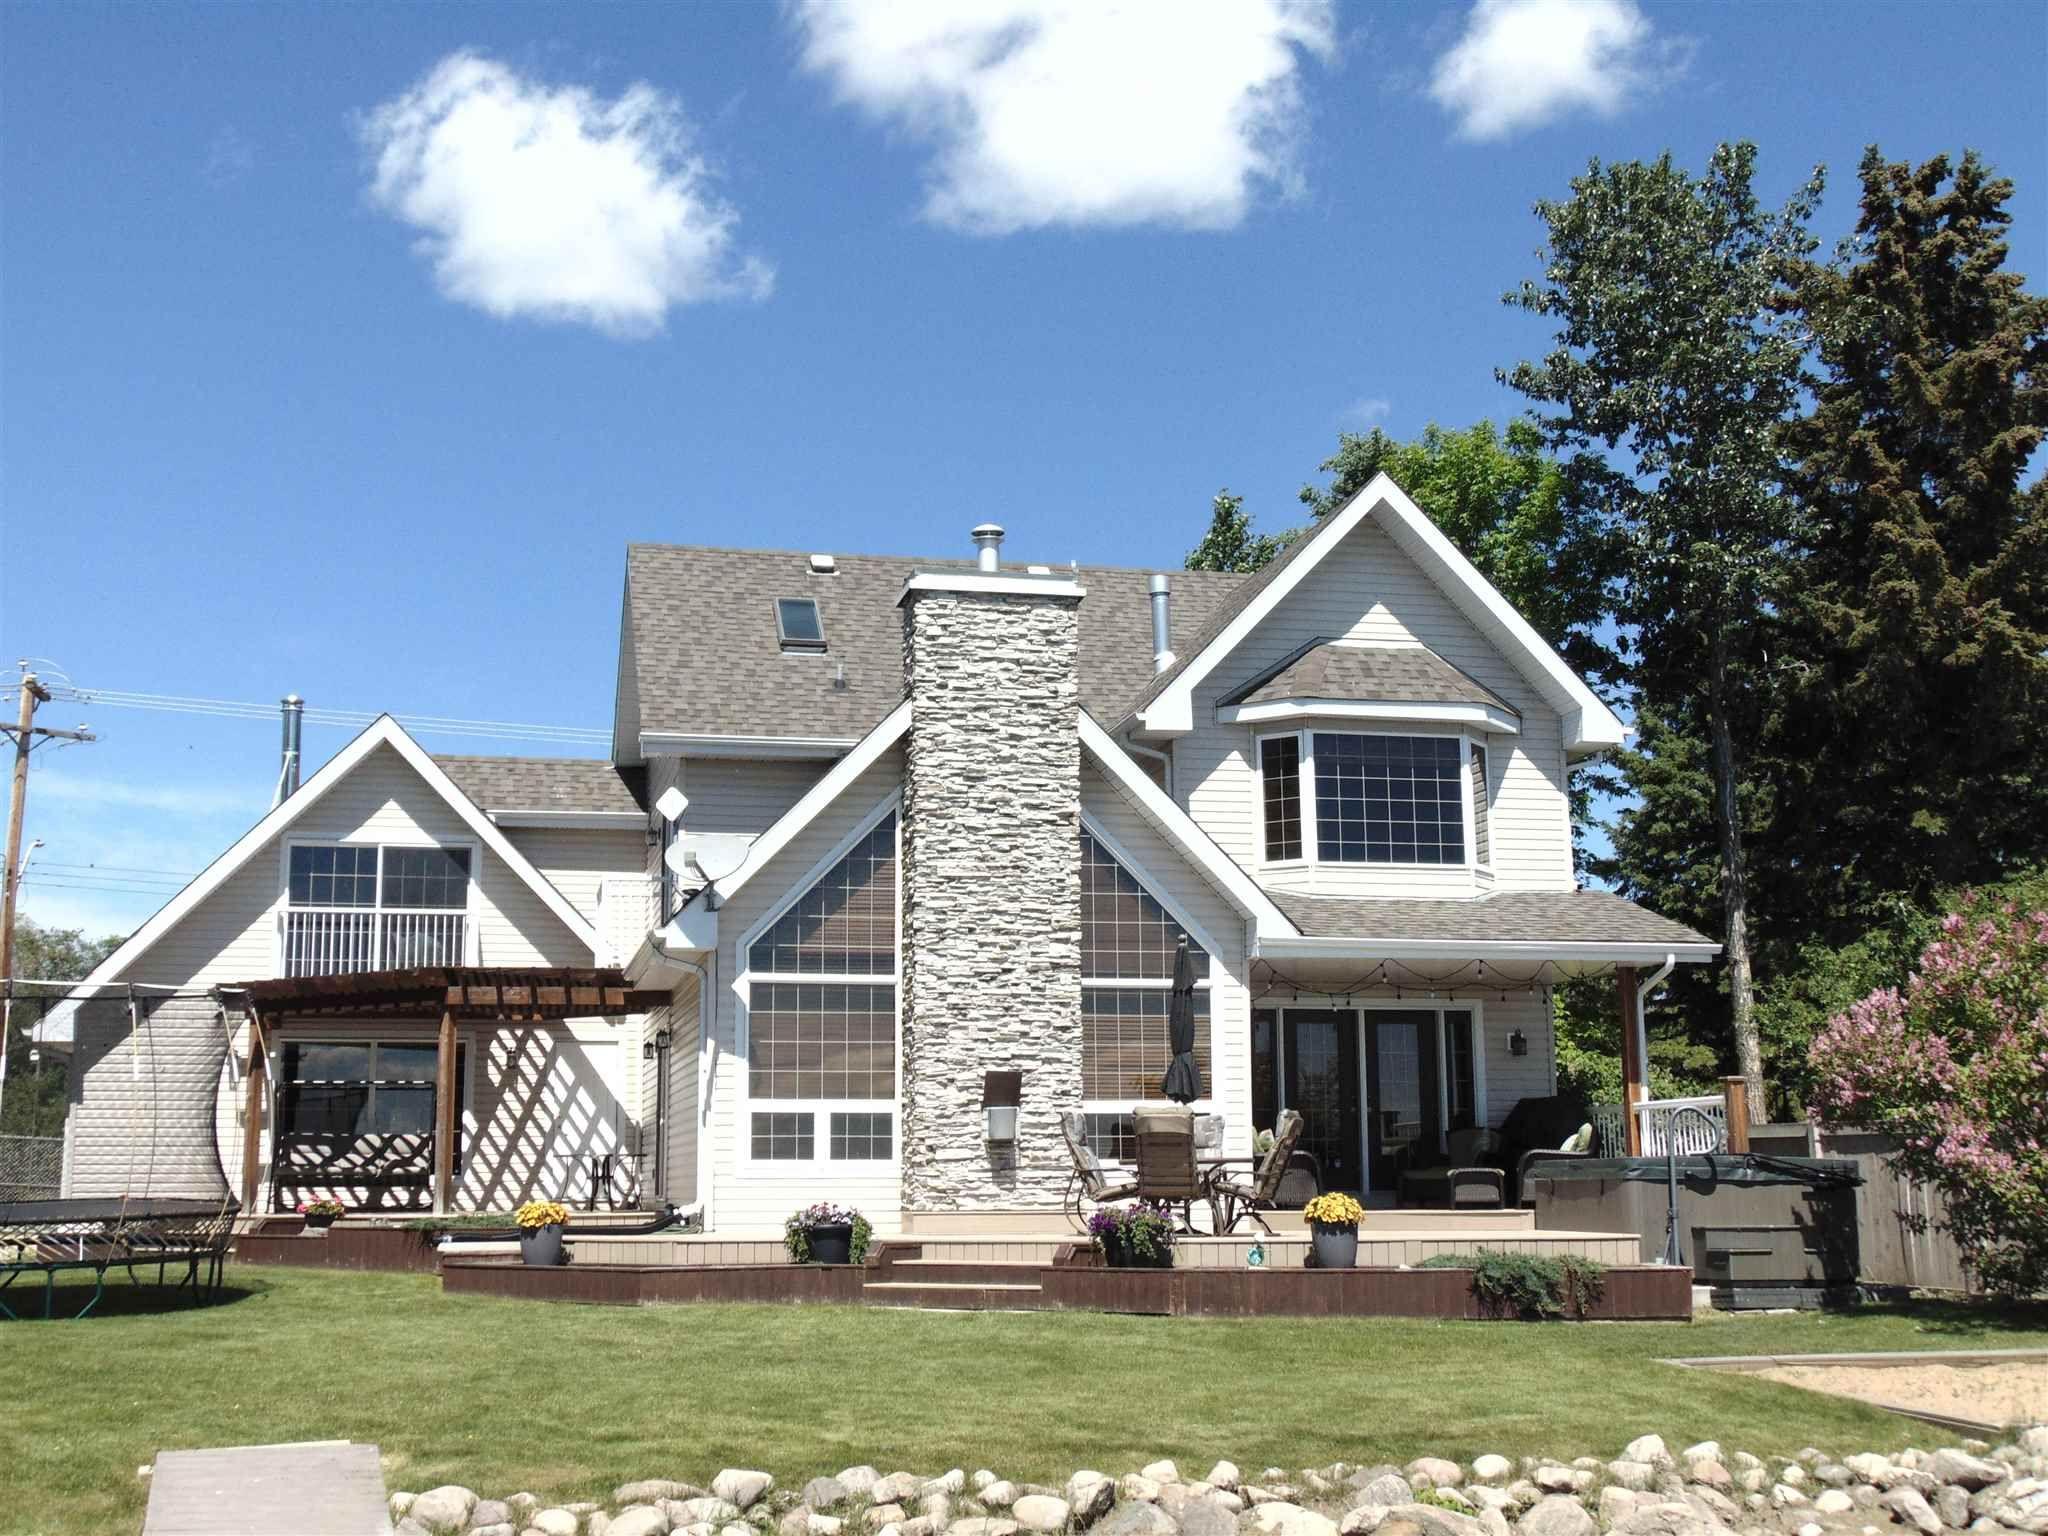 Main Photo: 106 Argentia Beach: Rural Wetaskiwin County House for sale : MLS®# E4264495